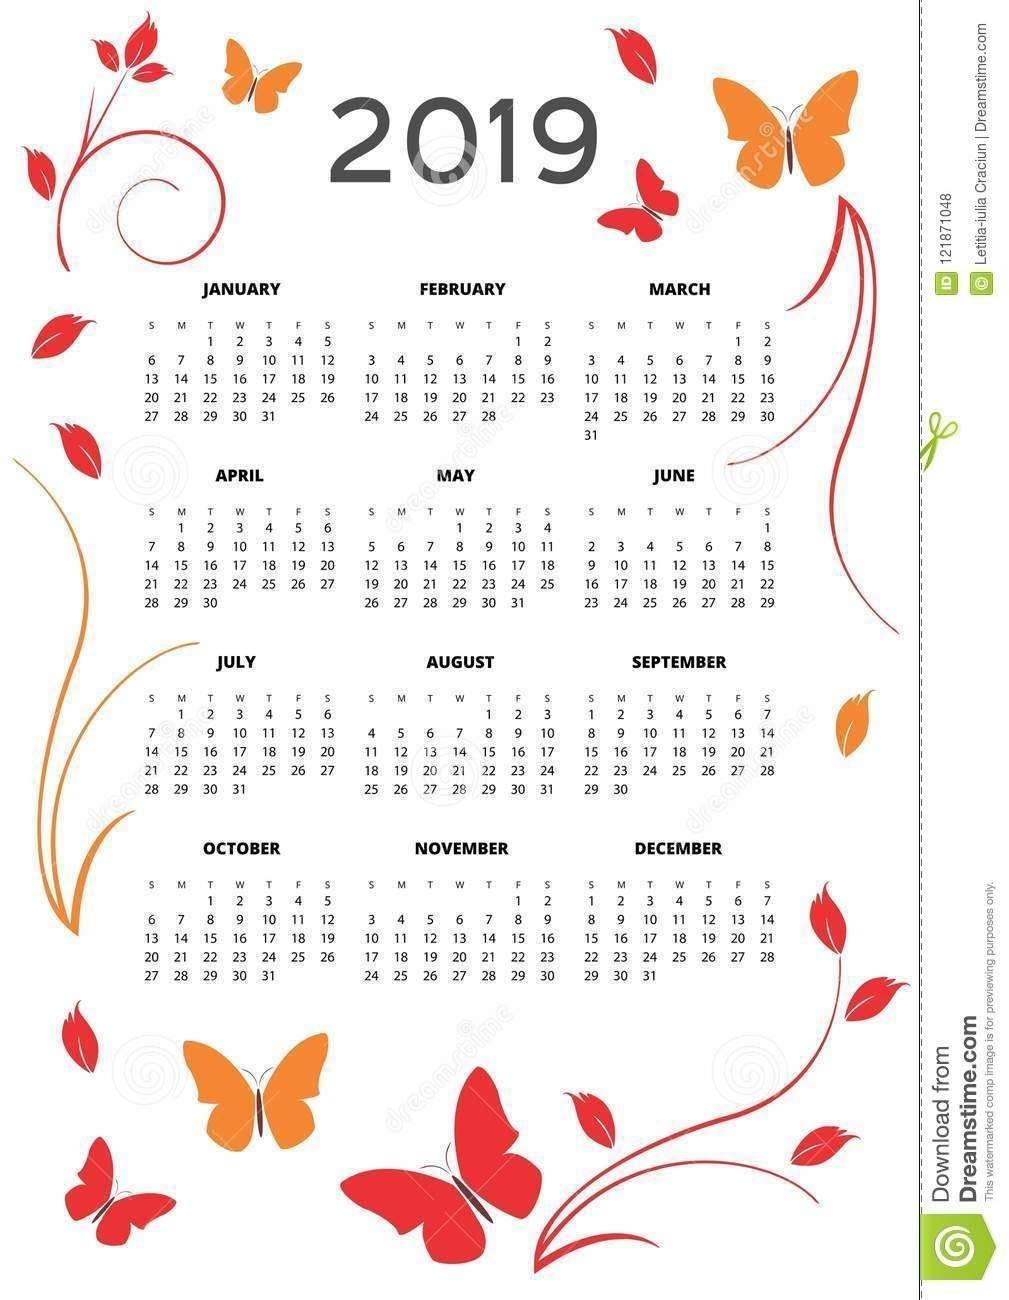 Calendar Printables Design Calendar Ideas Diy Printable Feree Blank Butterfy Calendar Month To Fill In